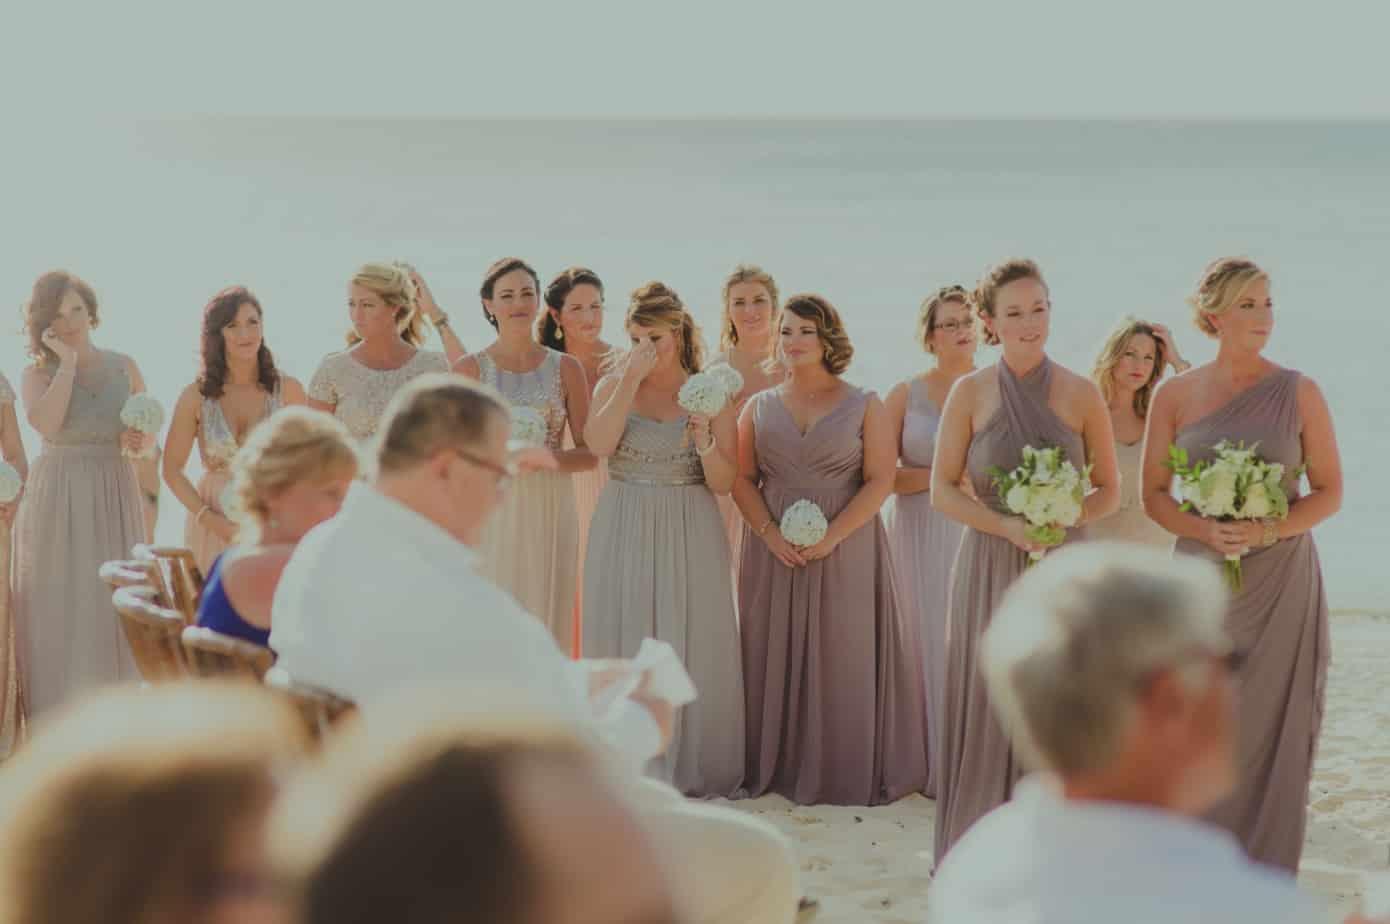 wedding-ceremony-bridesmaids-celebrations-ltd-cayman-islands-destination-wedding-2